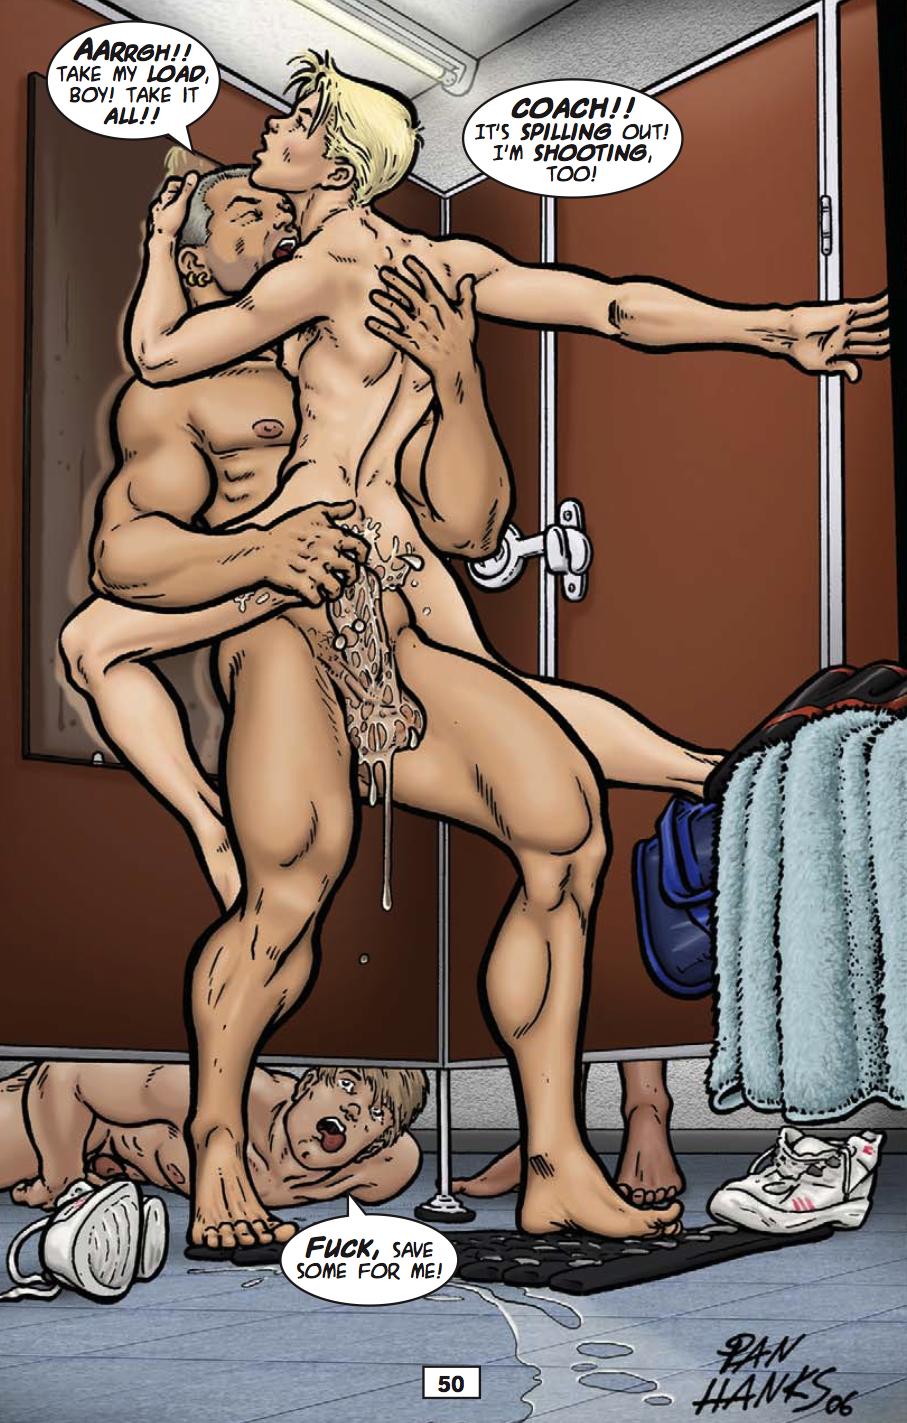 Порно Комиксы Про Геев